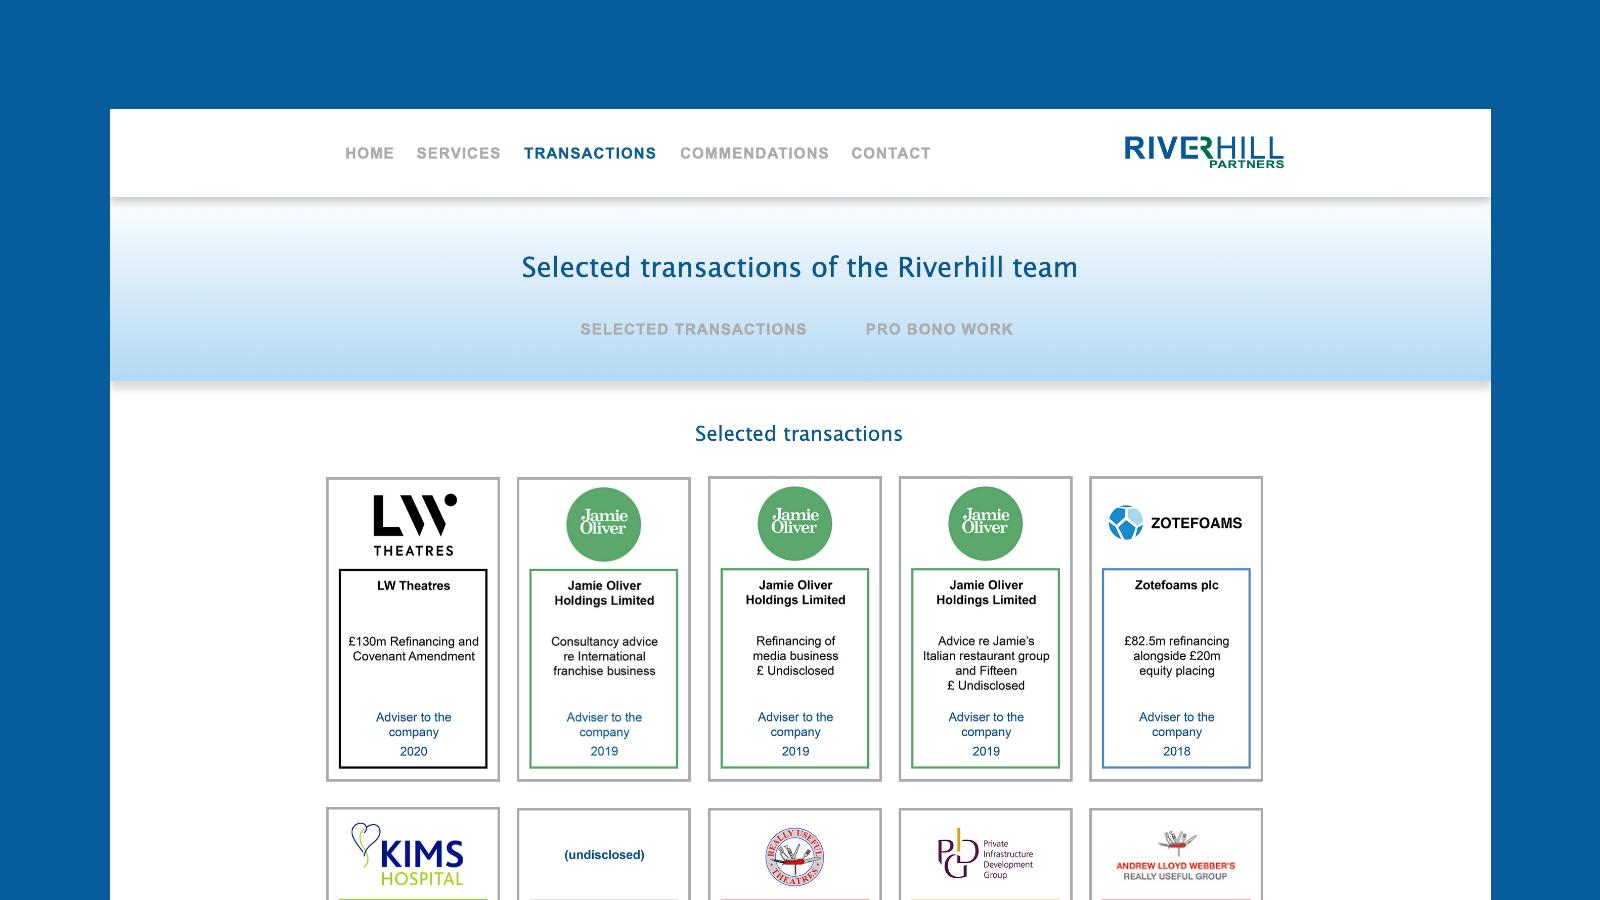 Riverhill Partners Transactions screen